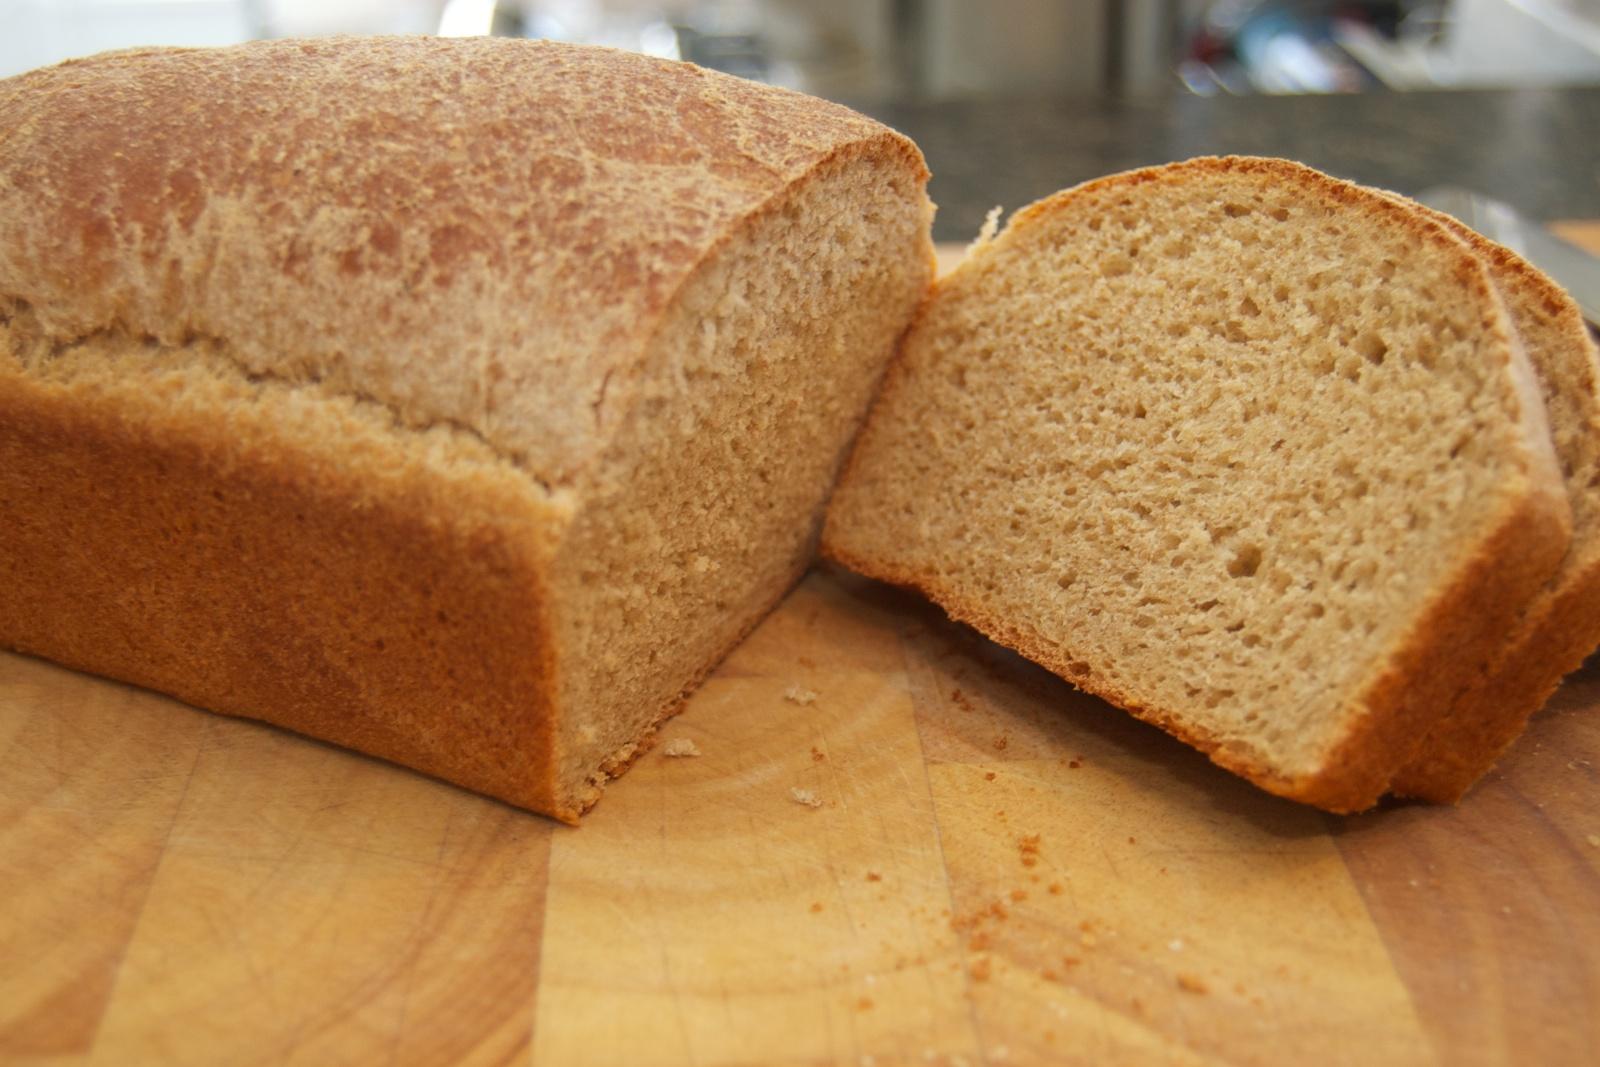 http://blog.rickk.com/food/2011/03/23/ate.2011.03.23.c2.jpg